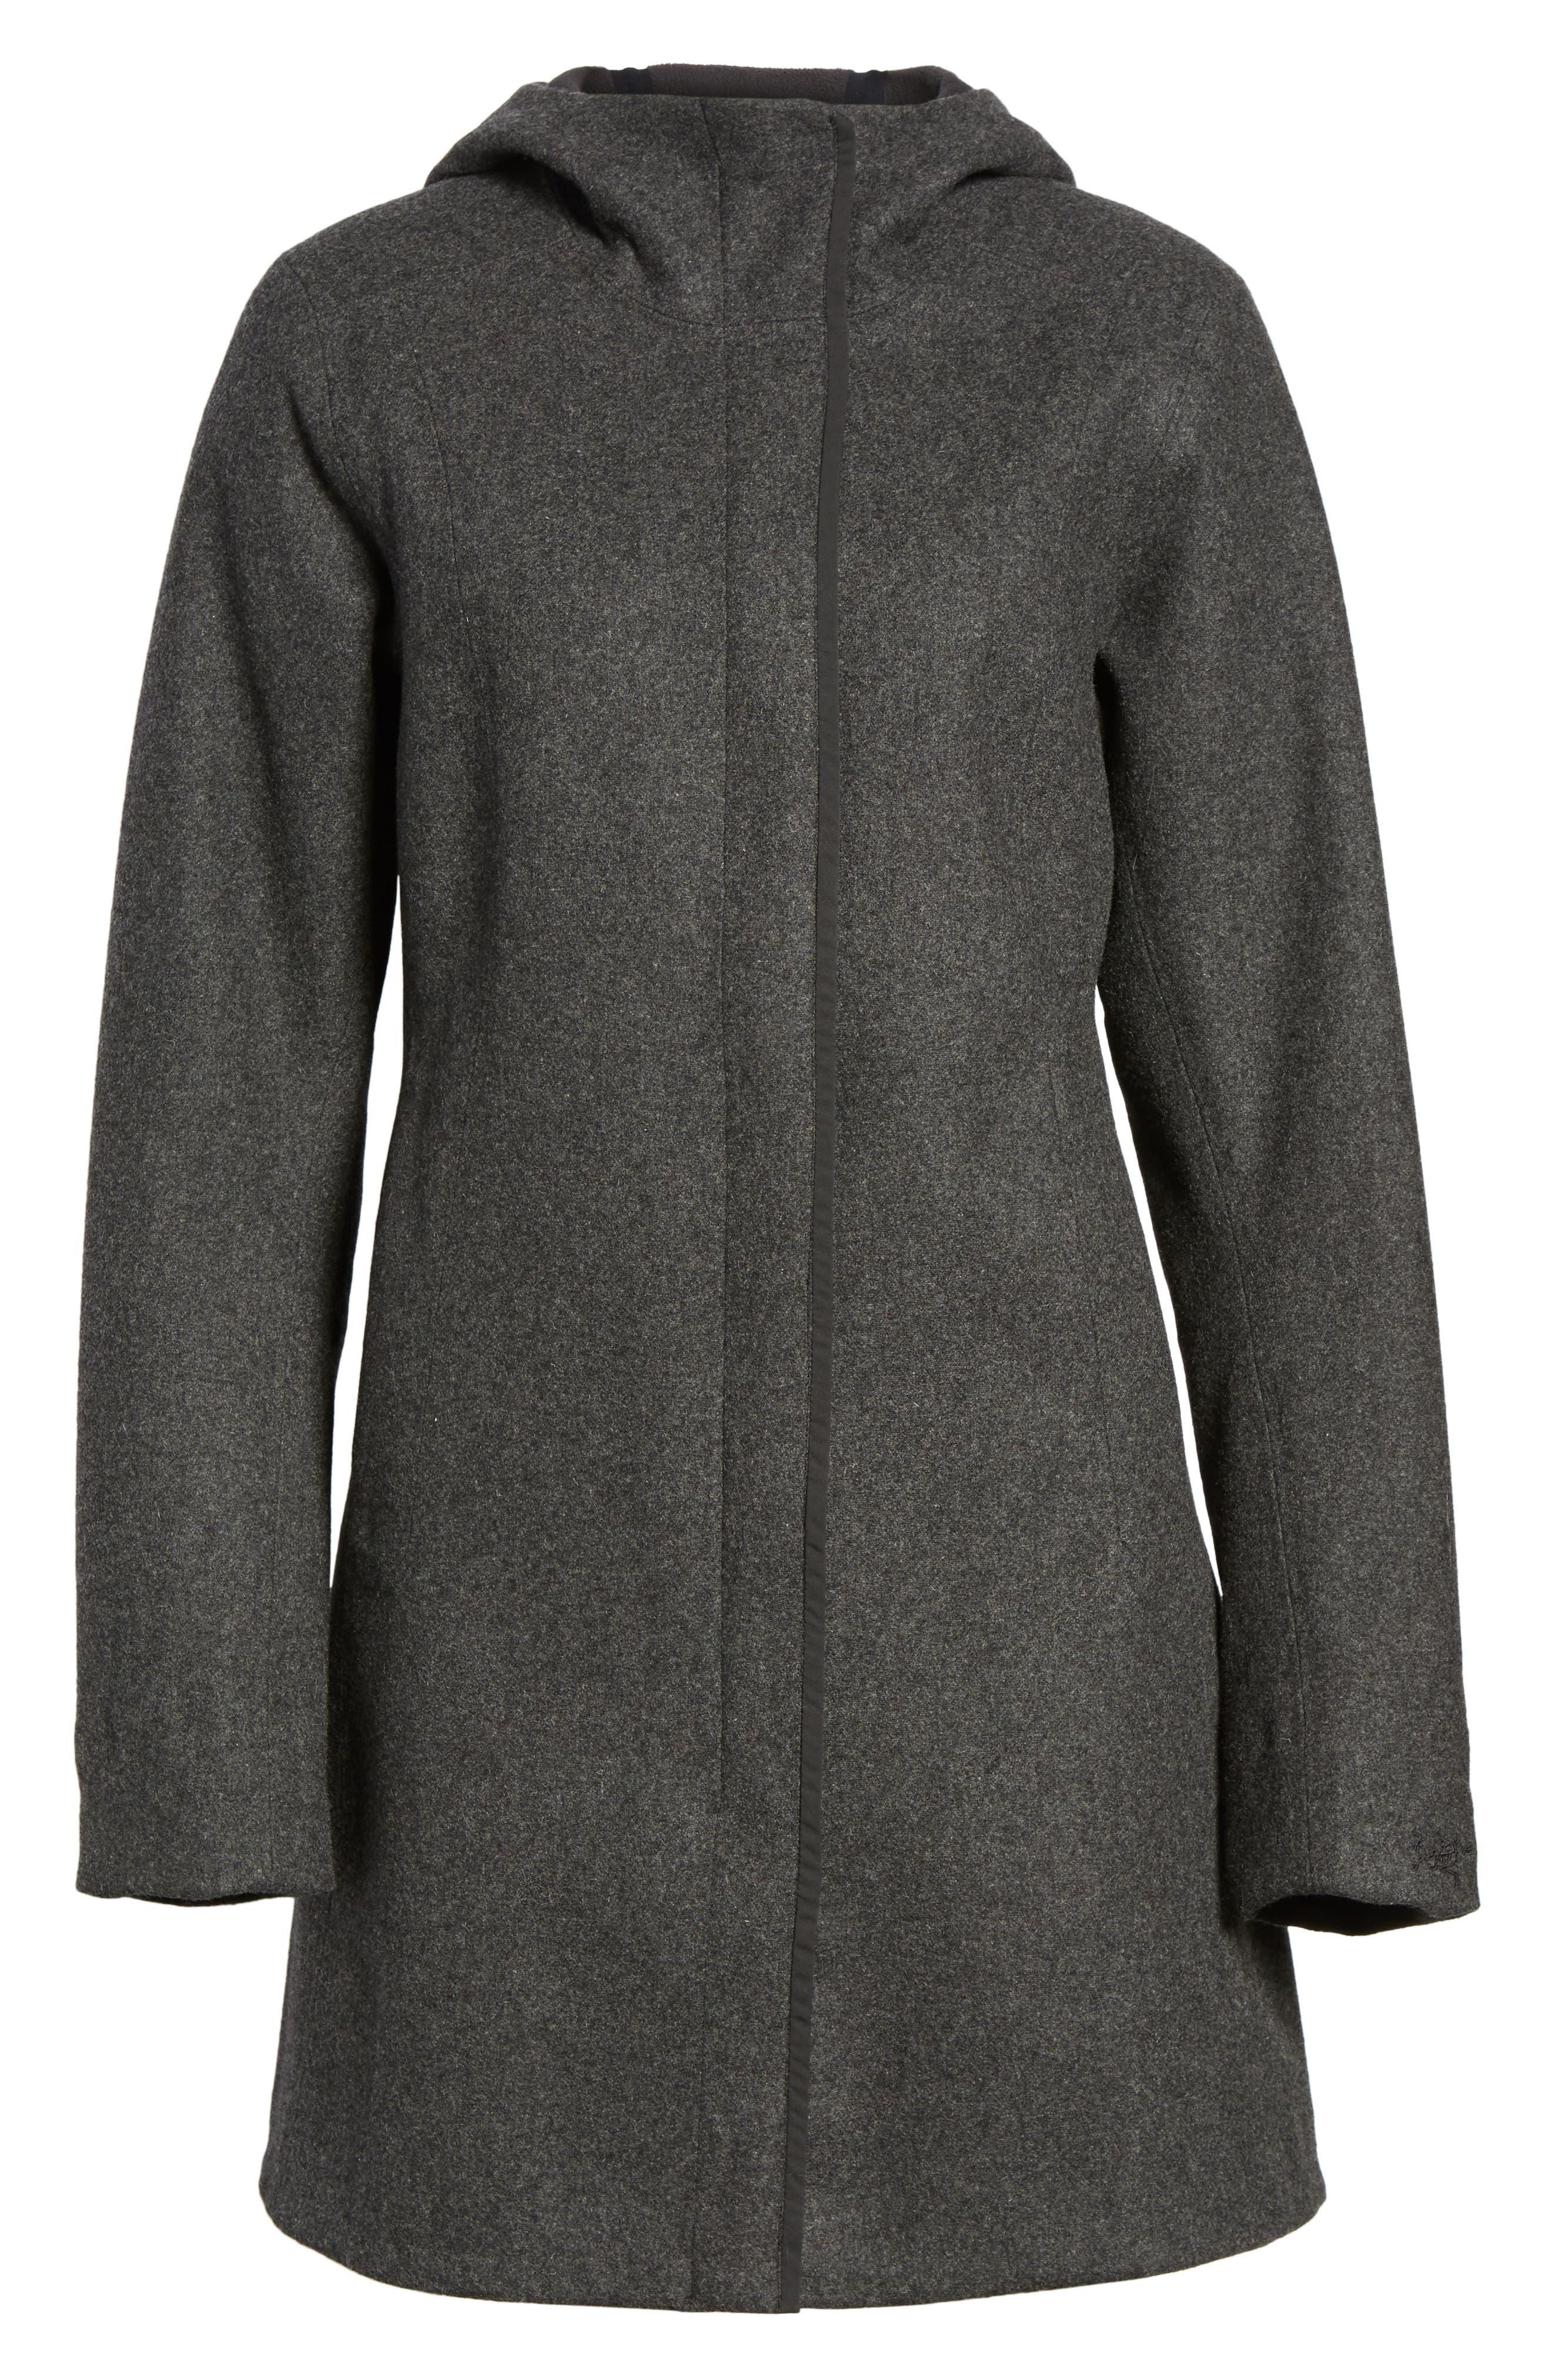 Embra Hooded Walking Coat,                             Alternate thumbnail 5, color,                             001